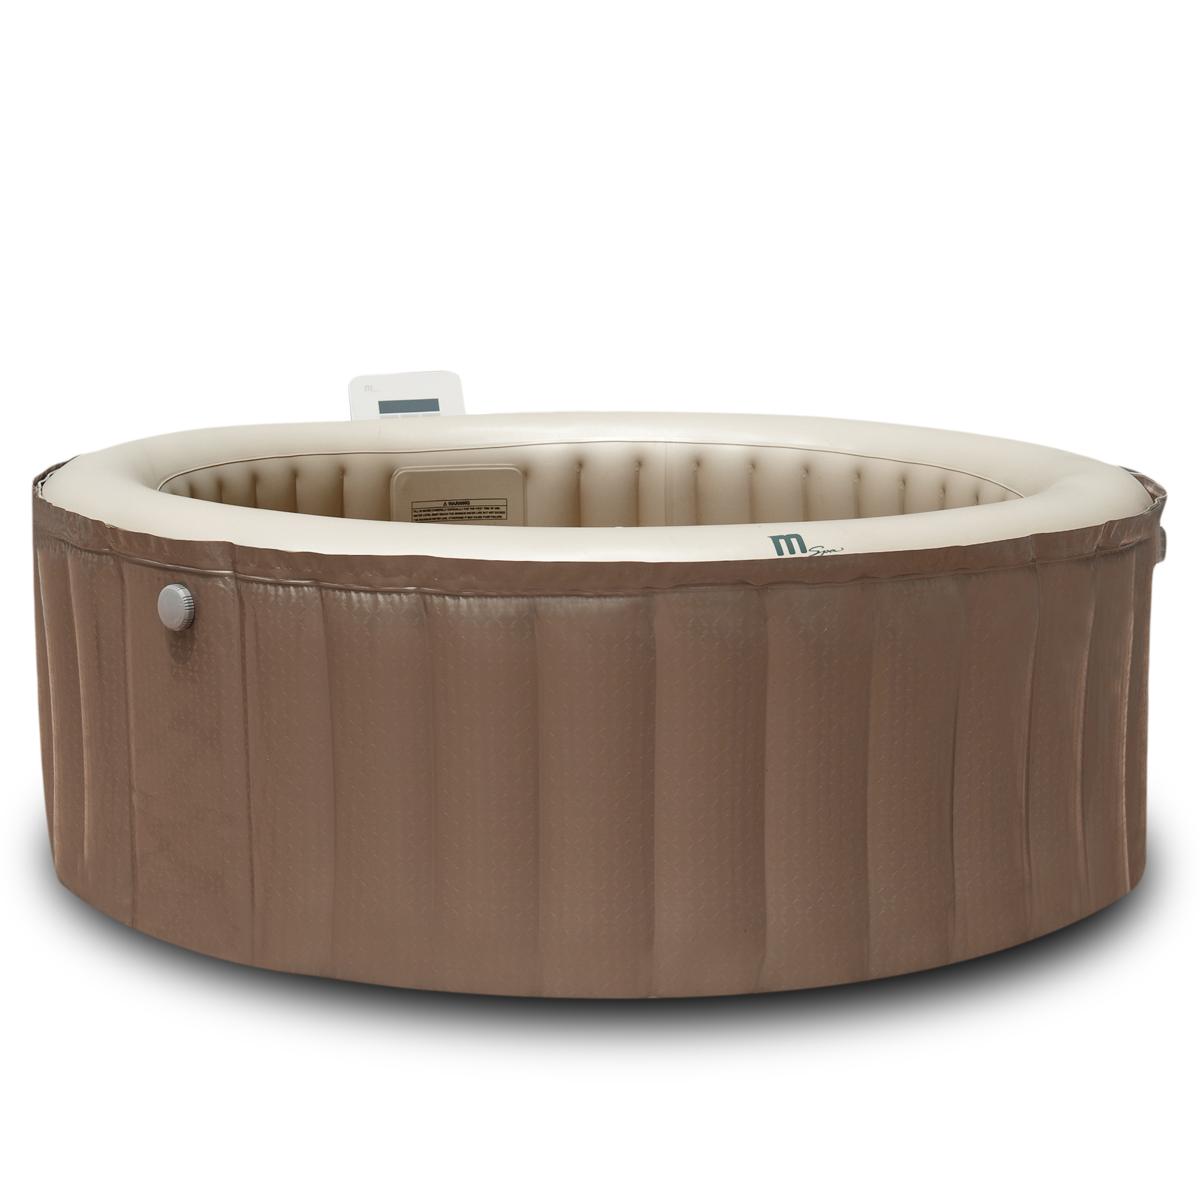 whirlpool mit heizung massage aufblasbar 180x70 f r 4. Black Bedroom Furniture Sets. Home Design Ideas